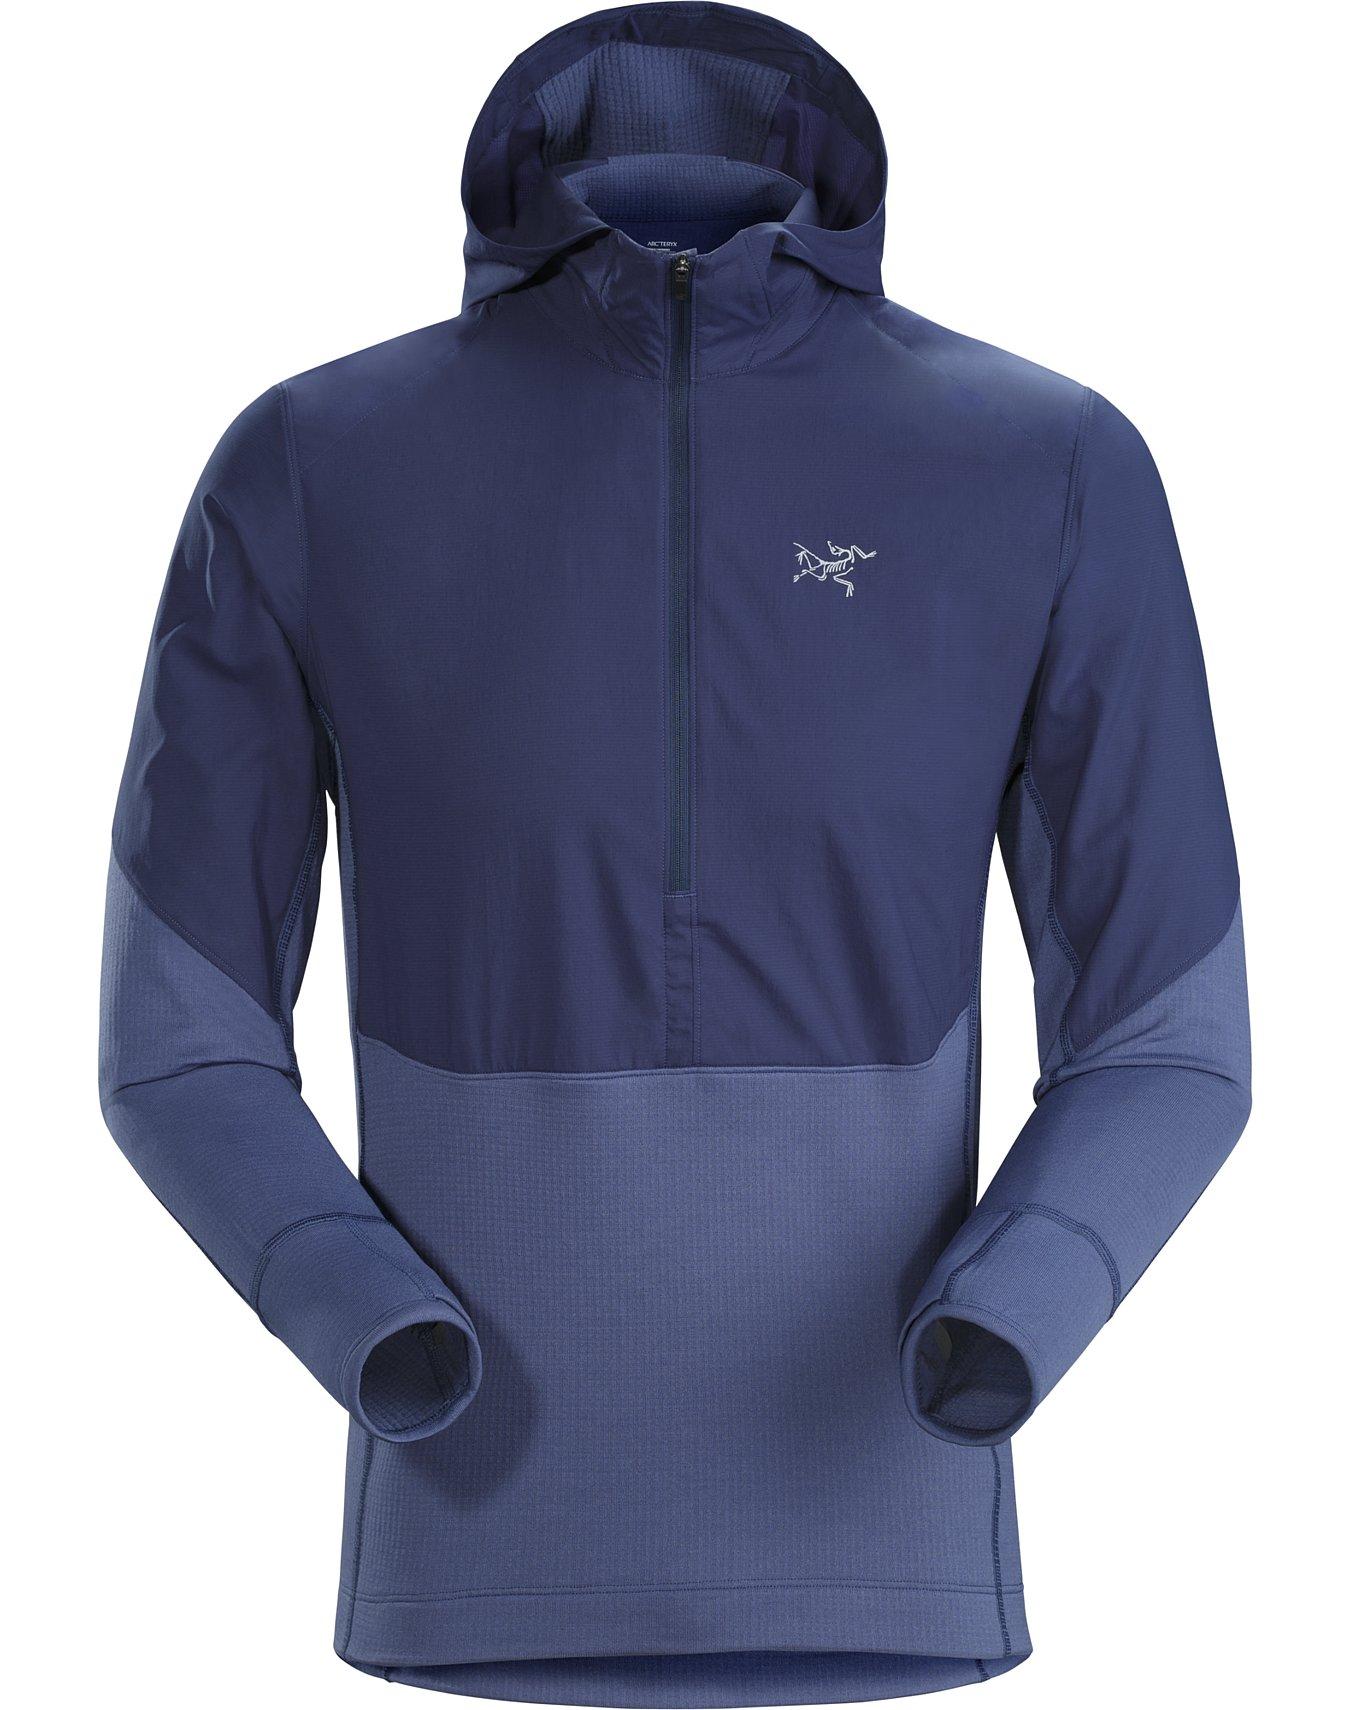 Rock It Herren Zipper Hoodie Kapuzen Sweater Jacke